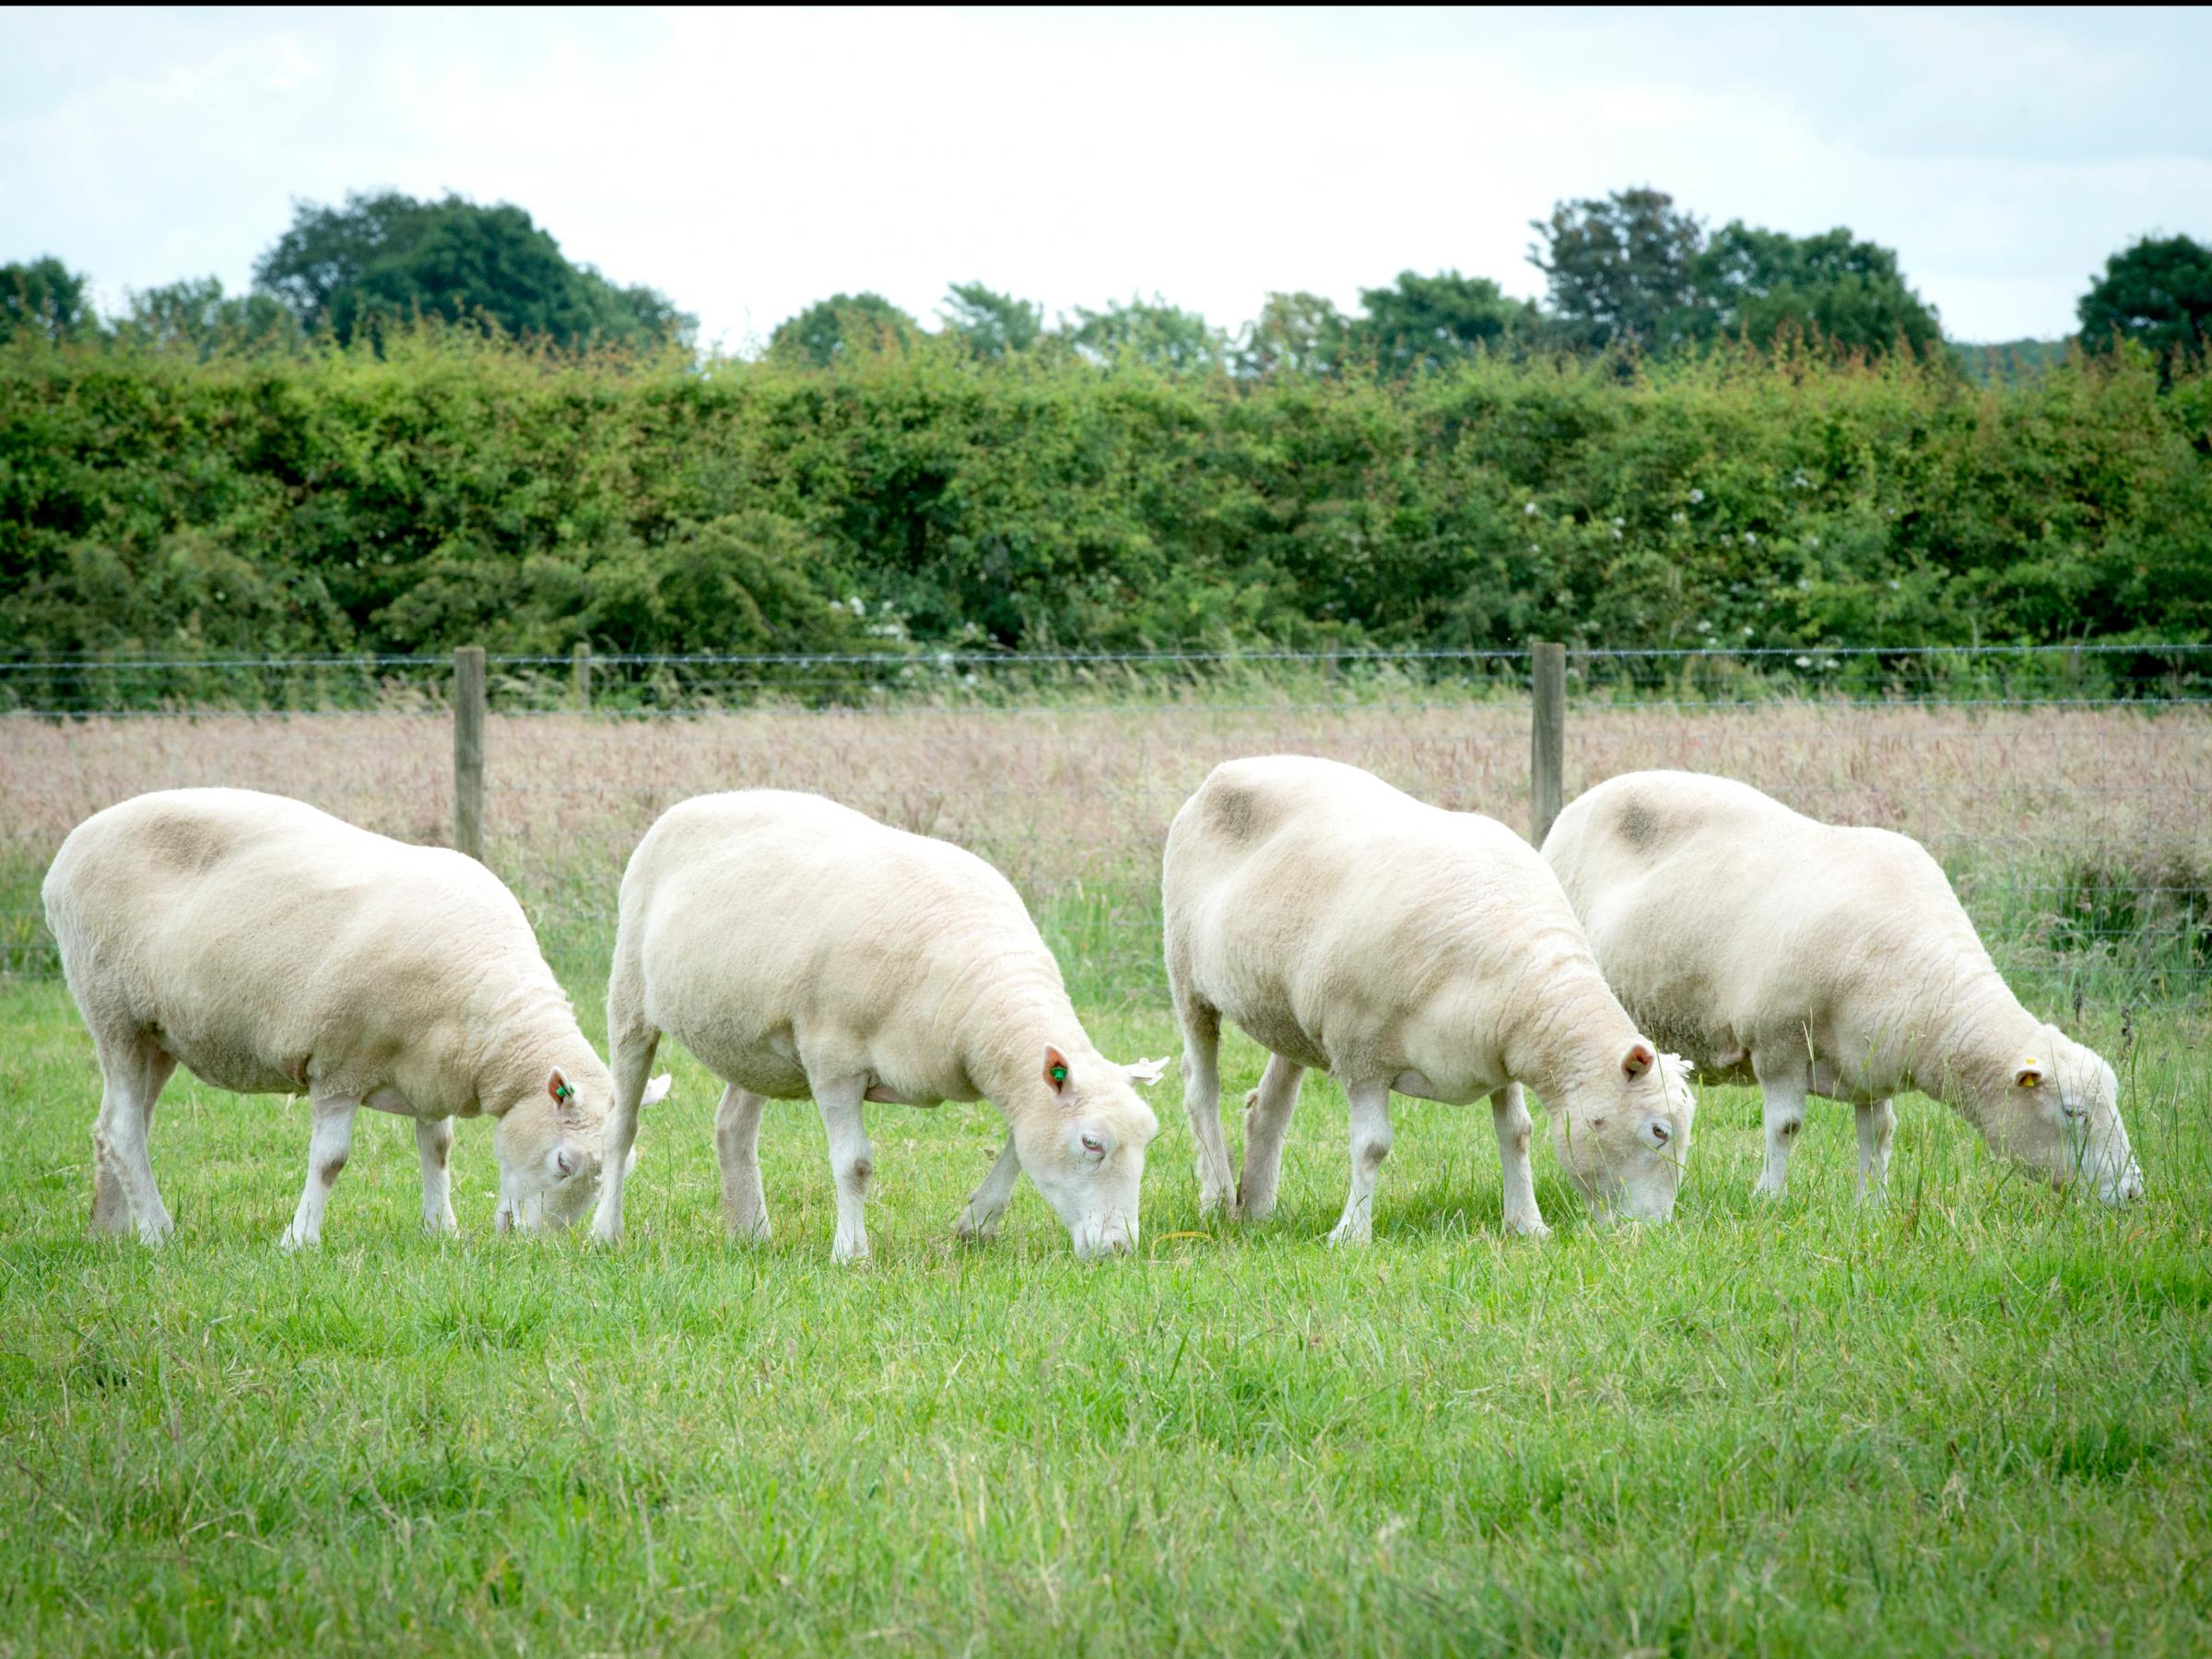 nottingham-dollies-grazing-cloned-sheep